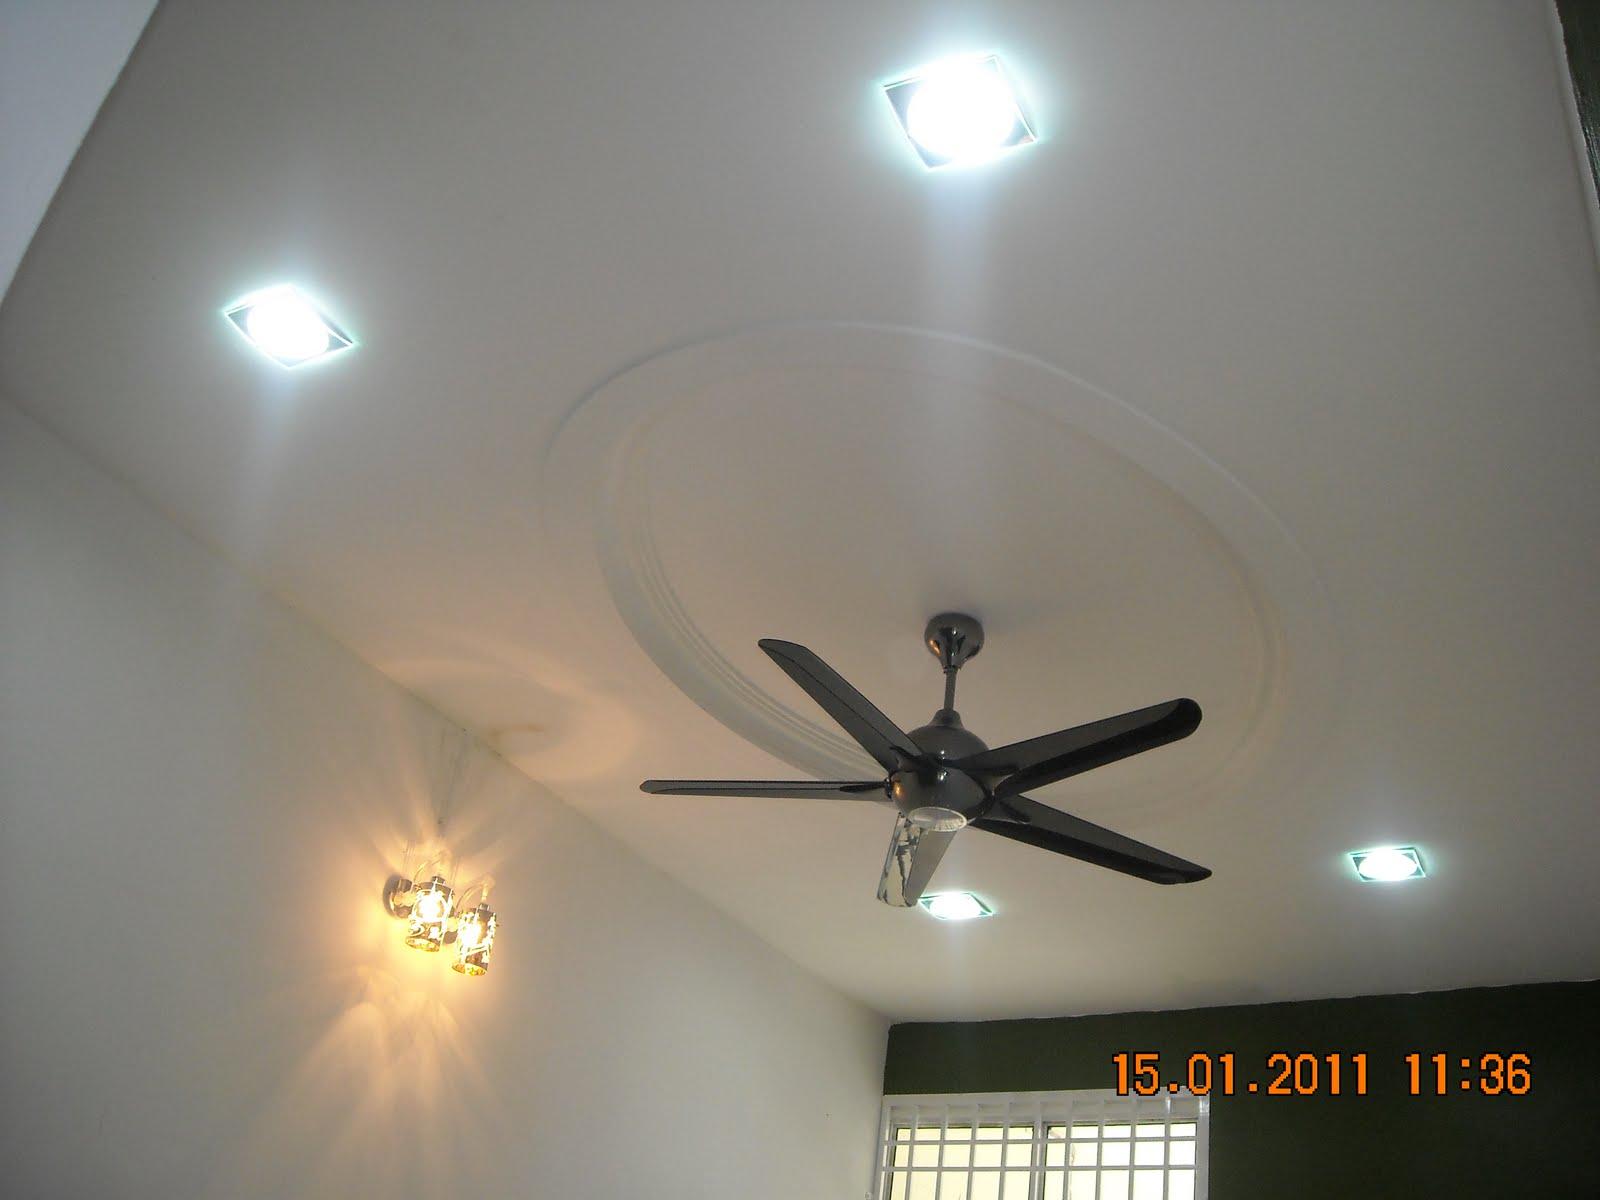 Upah Wiring Lampu Downlight Wire Data Schema Fibreopticdiagrampng Ruang Santaiku Deko Rumah Pasang Dan Kipas Rh Macosantana Blogspot Com Kuning Hangat